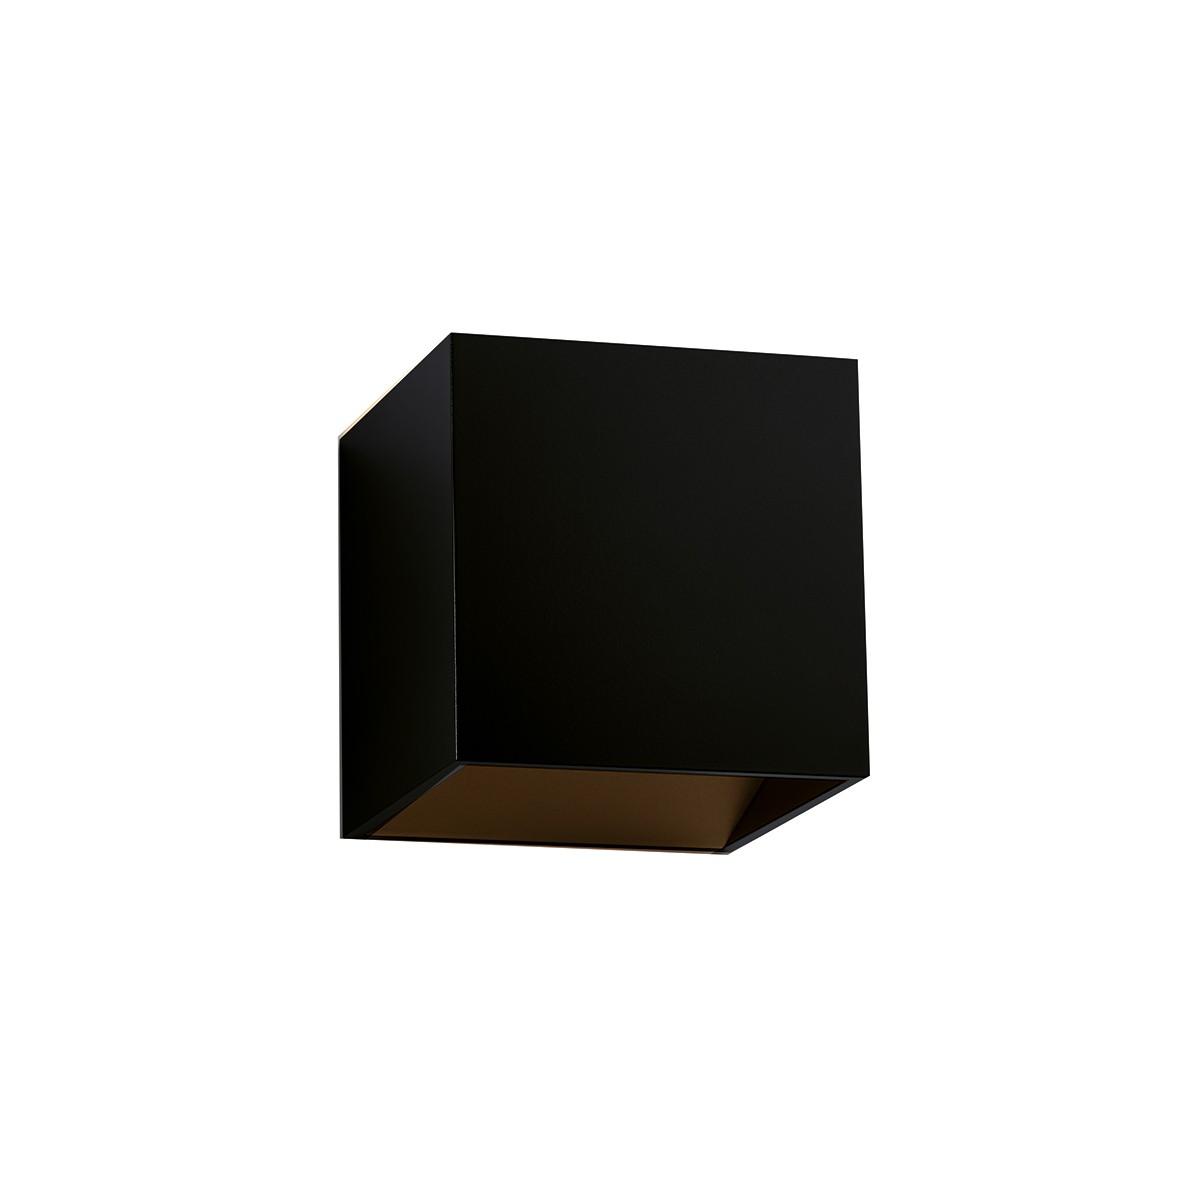 Bruck Cranny LED W Wandleuchte, schwarz